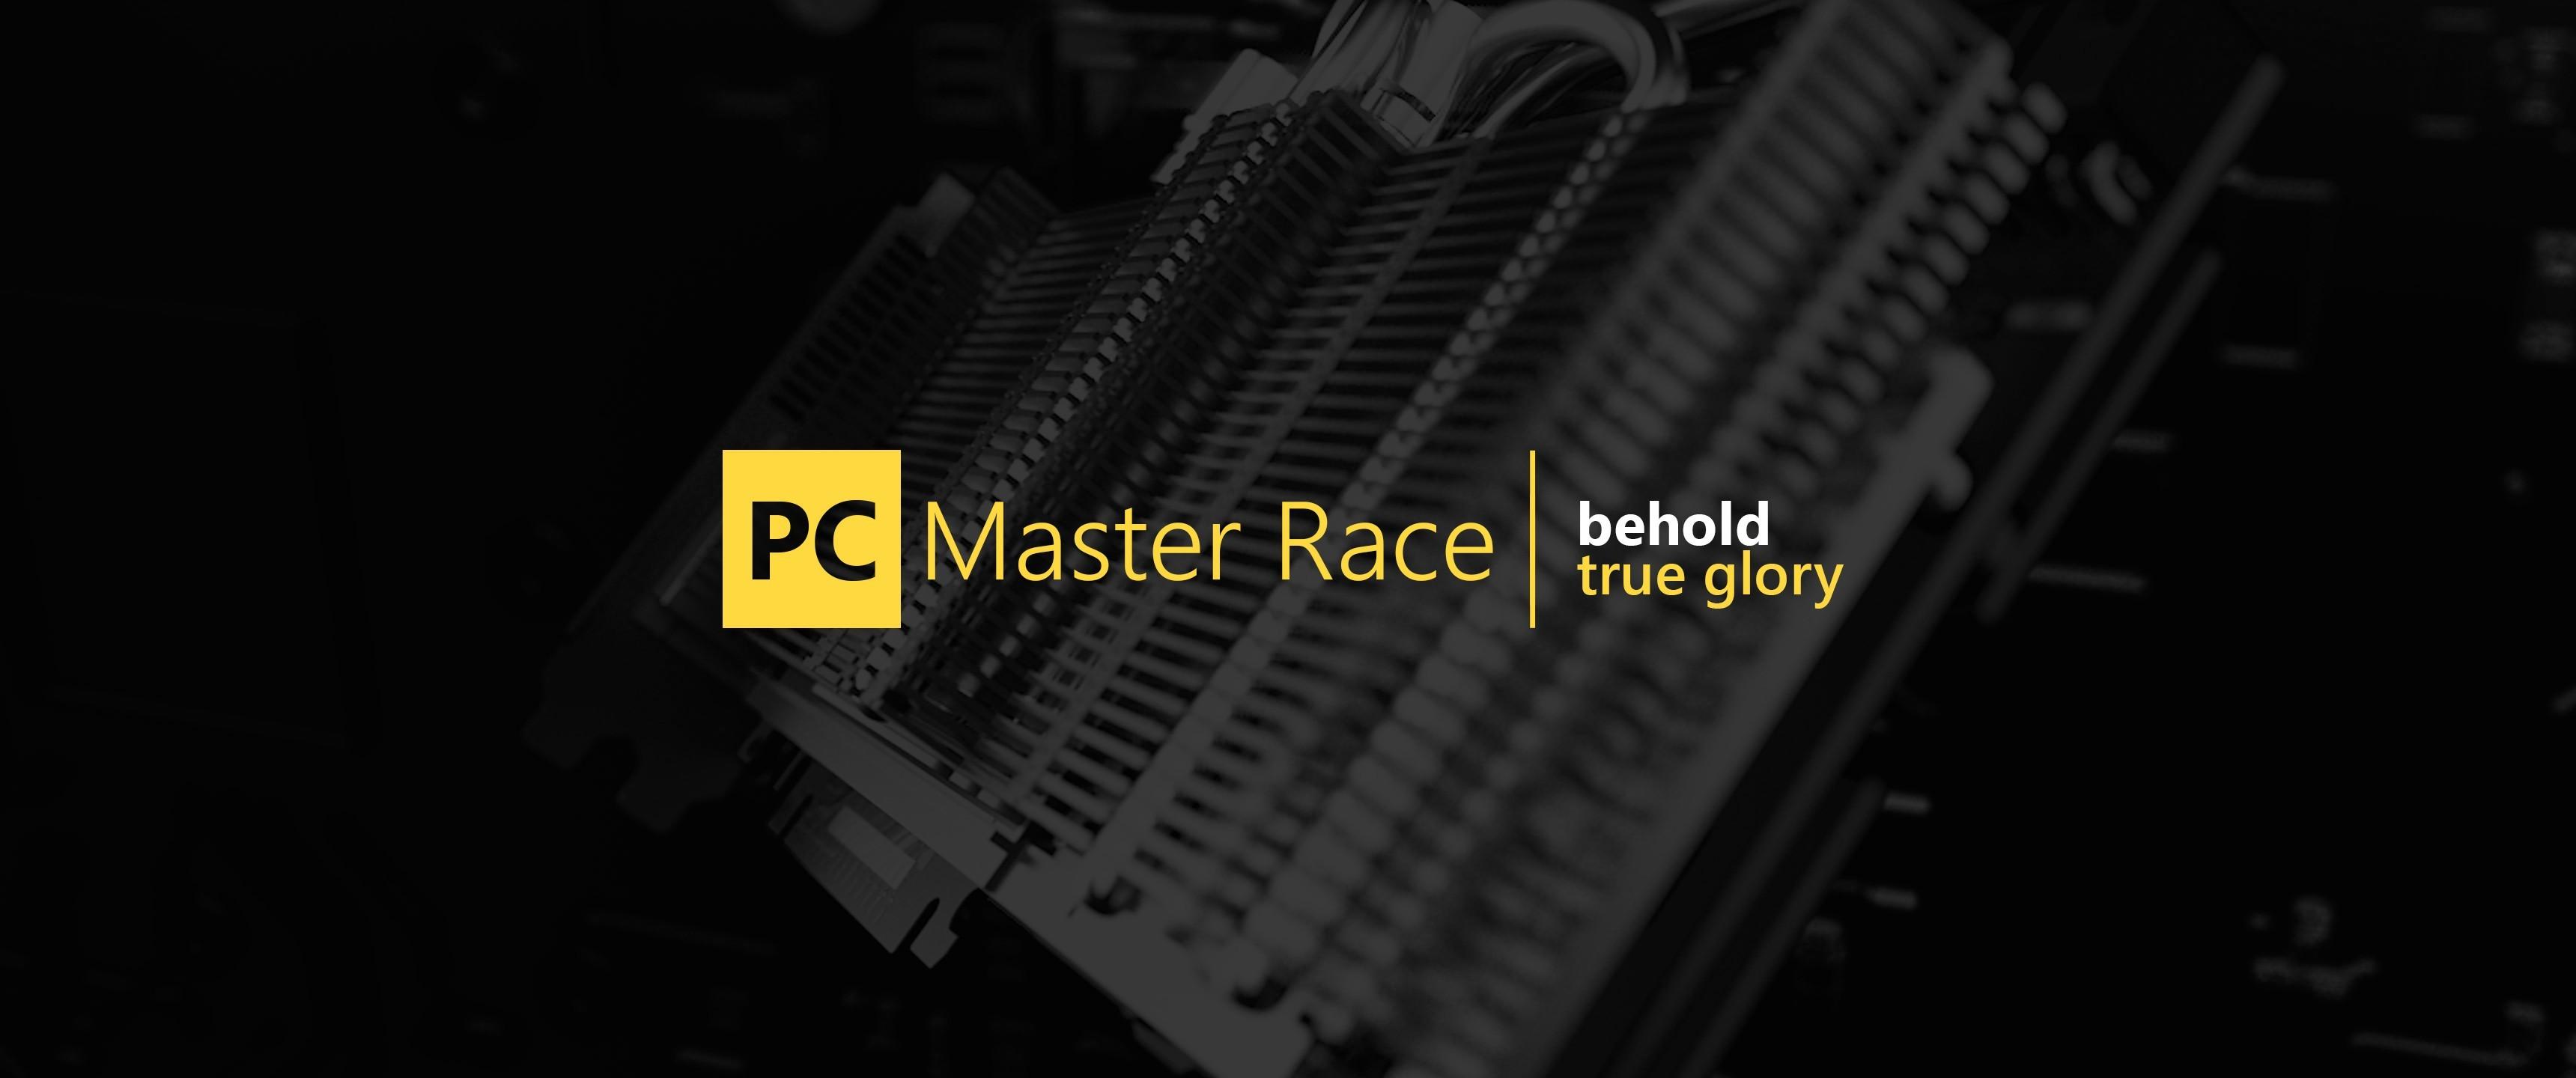 Wallpaper Pc Gaming Pc Master Race Brand Darkness Screenshot